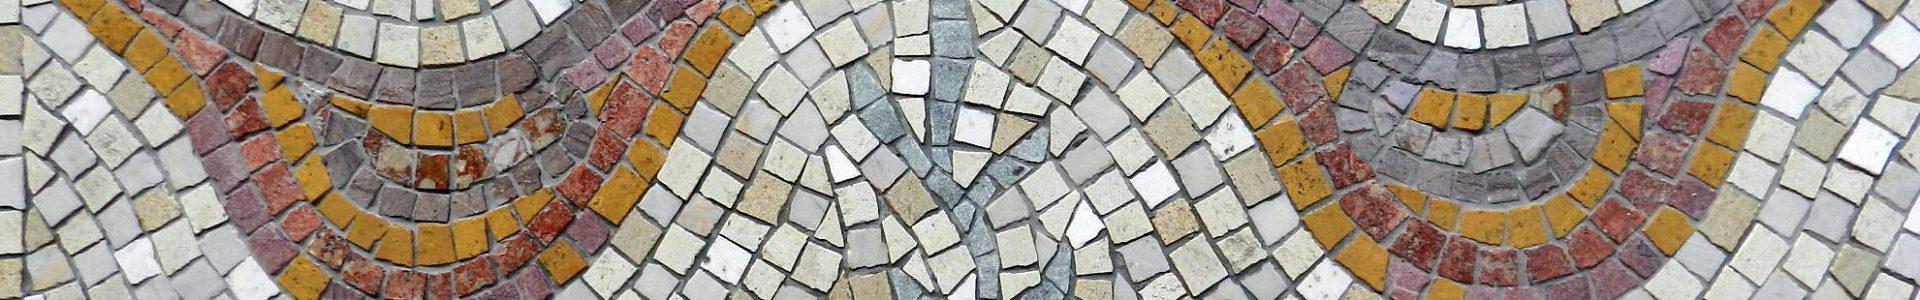 Love Birds Mosaic